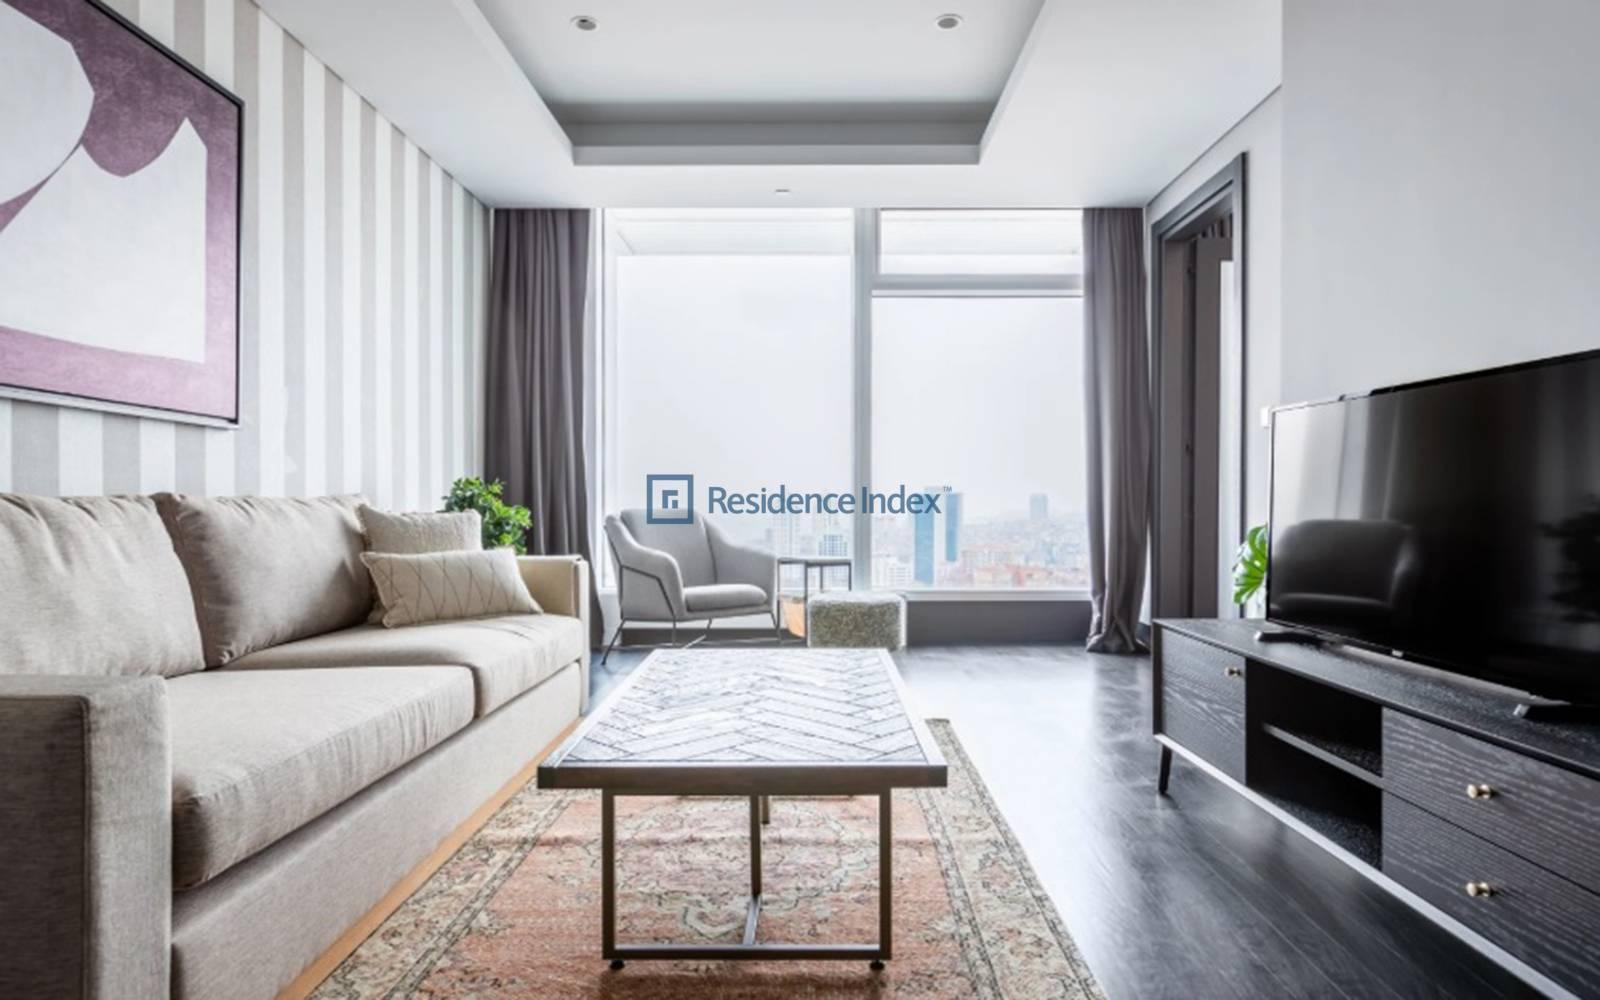 Quasar İstanbul - 1+1 Furnished Super Flat for Rent